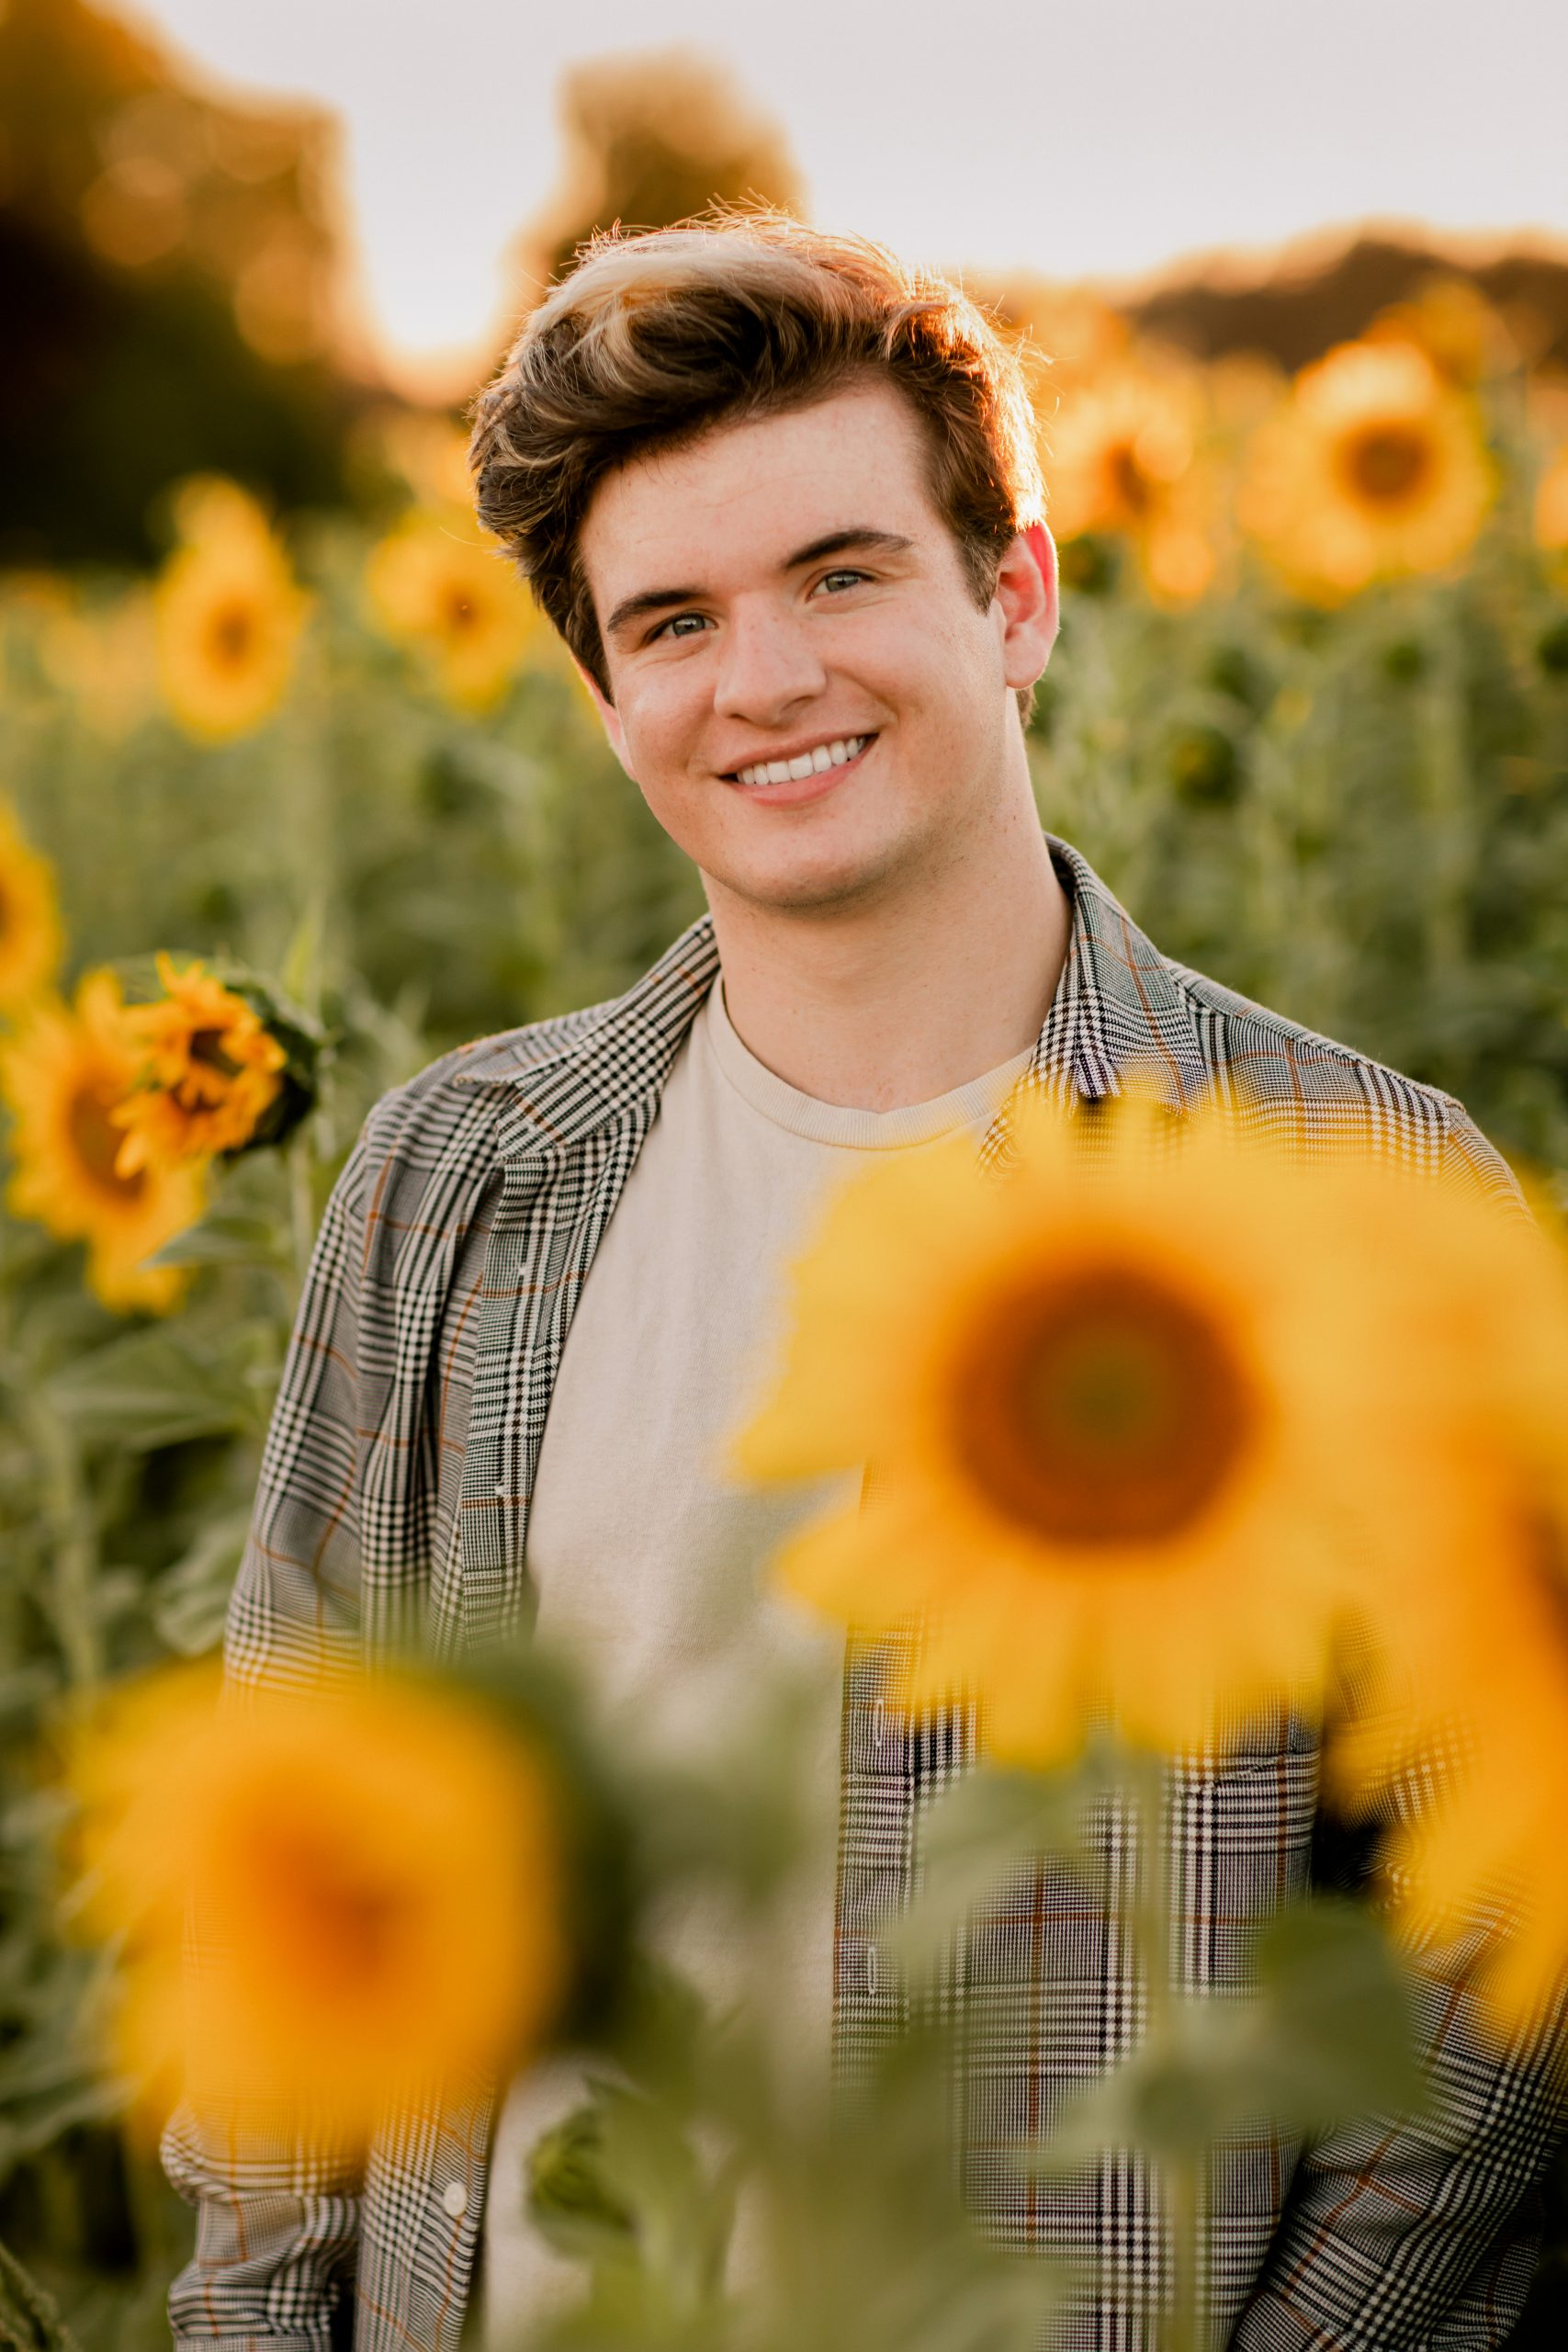 Senior Portraits at West Union sunflower field with Photographer Annie Helen